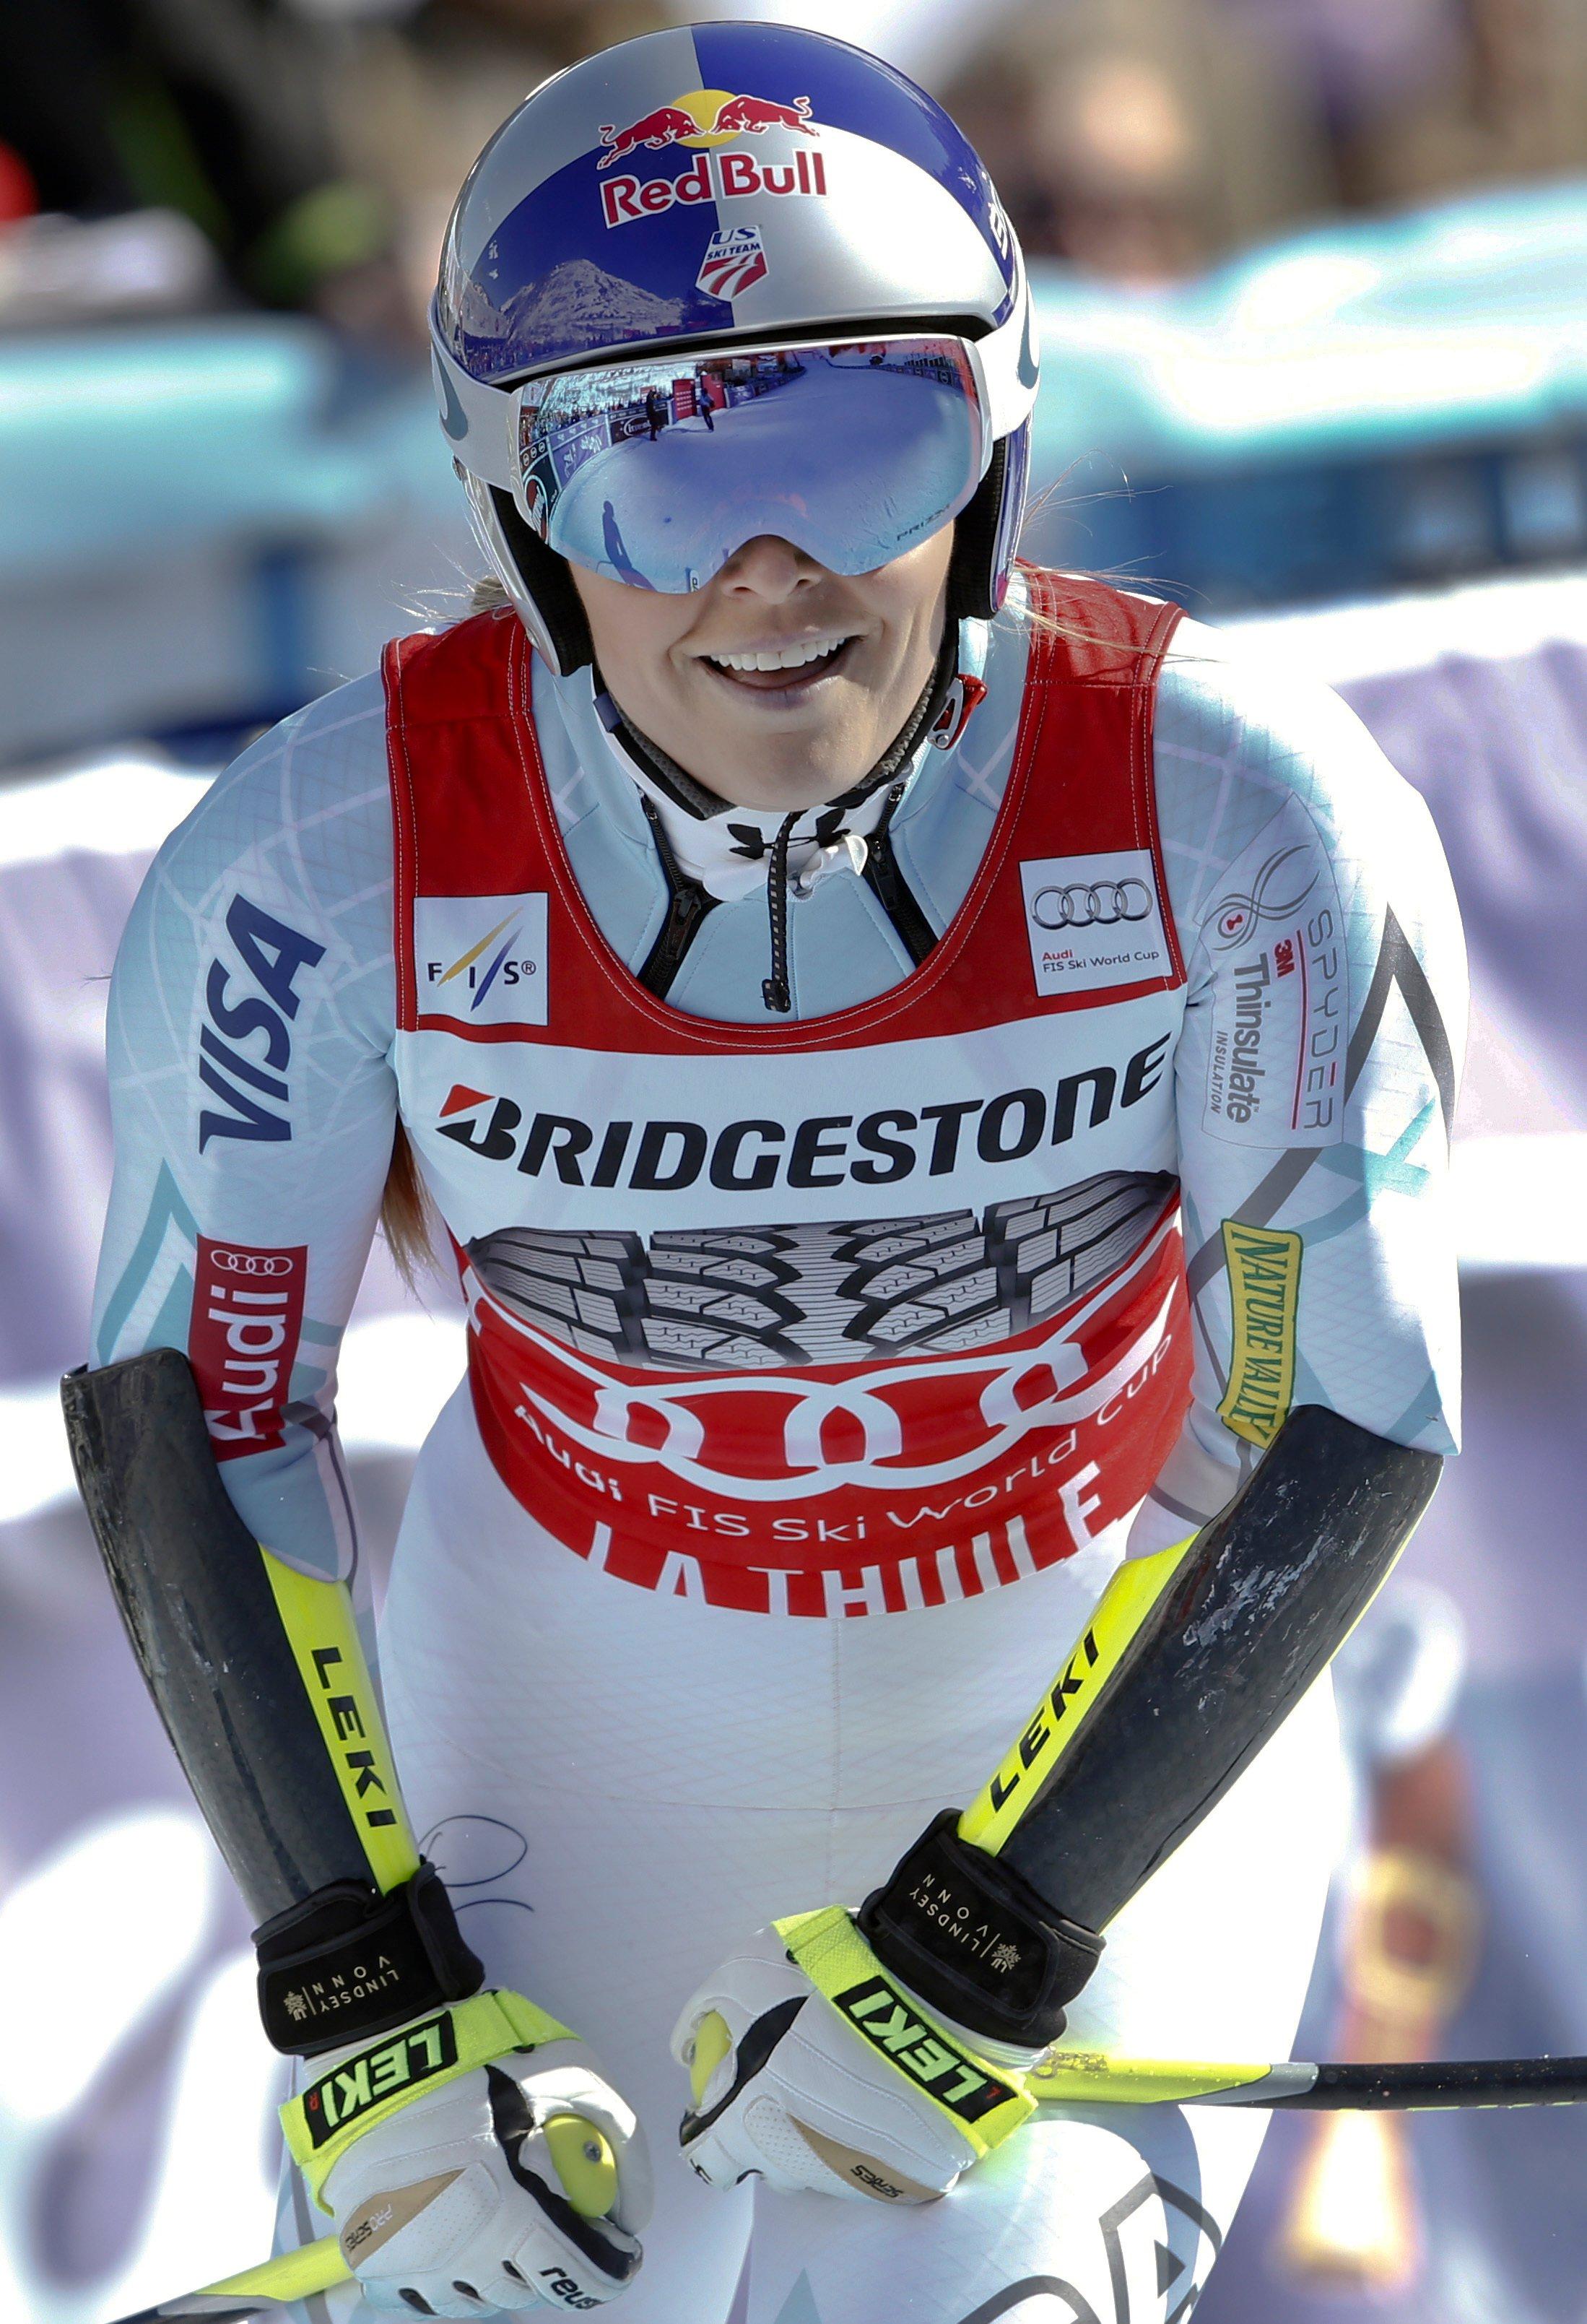 italy_alpine_skiing_world_cup-3a06ea34b6_r5805.jpeg